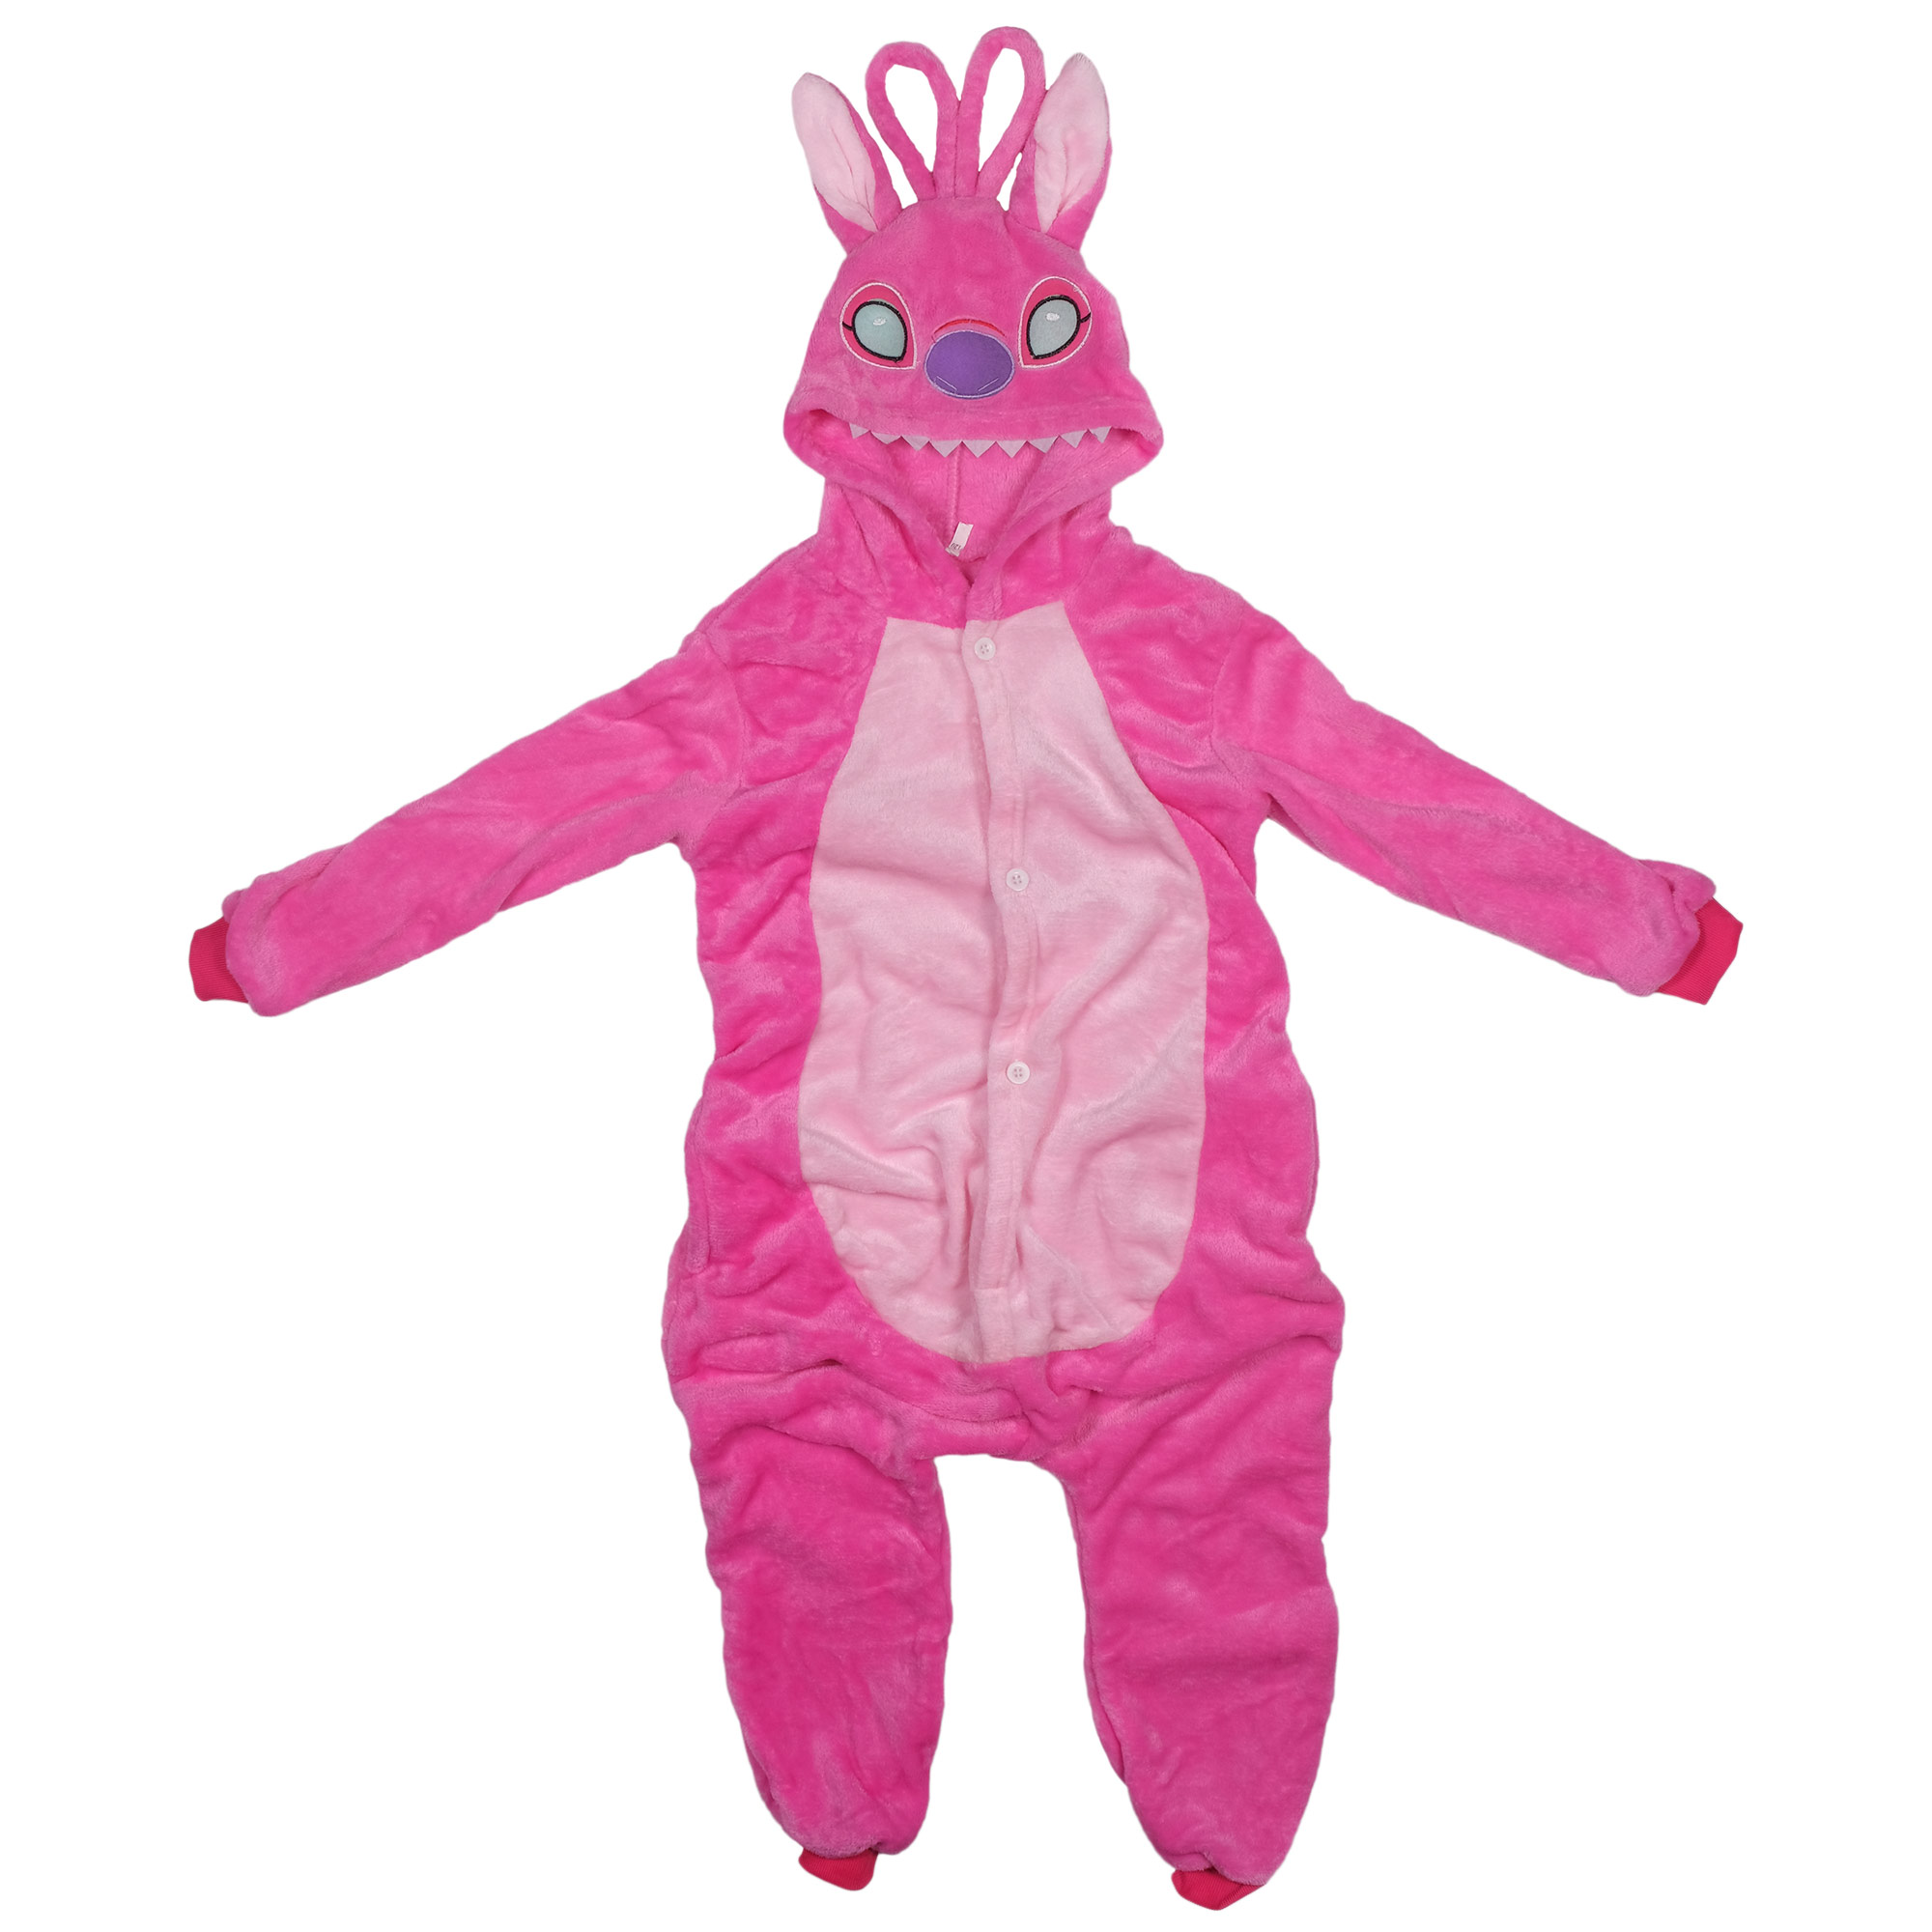 Пижама-кигуруми Lilkrok Лиловый Стич 160-169 см фото